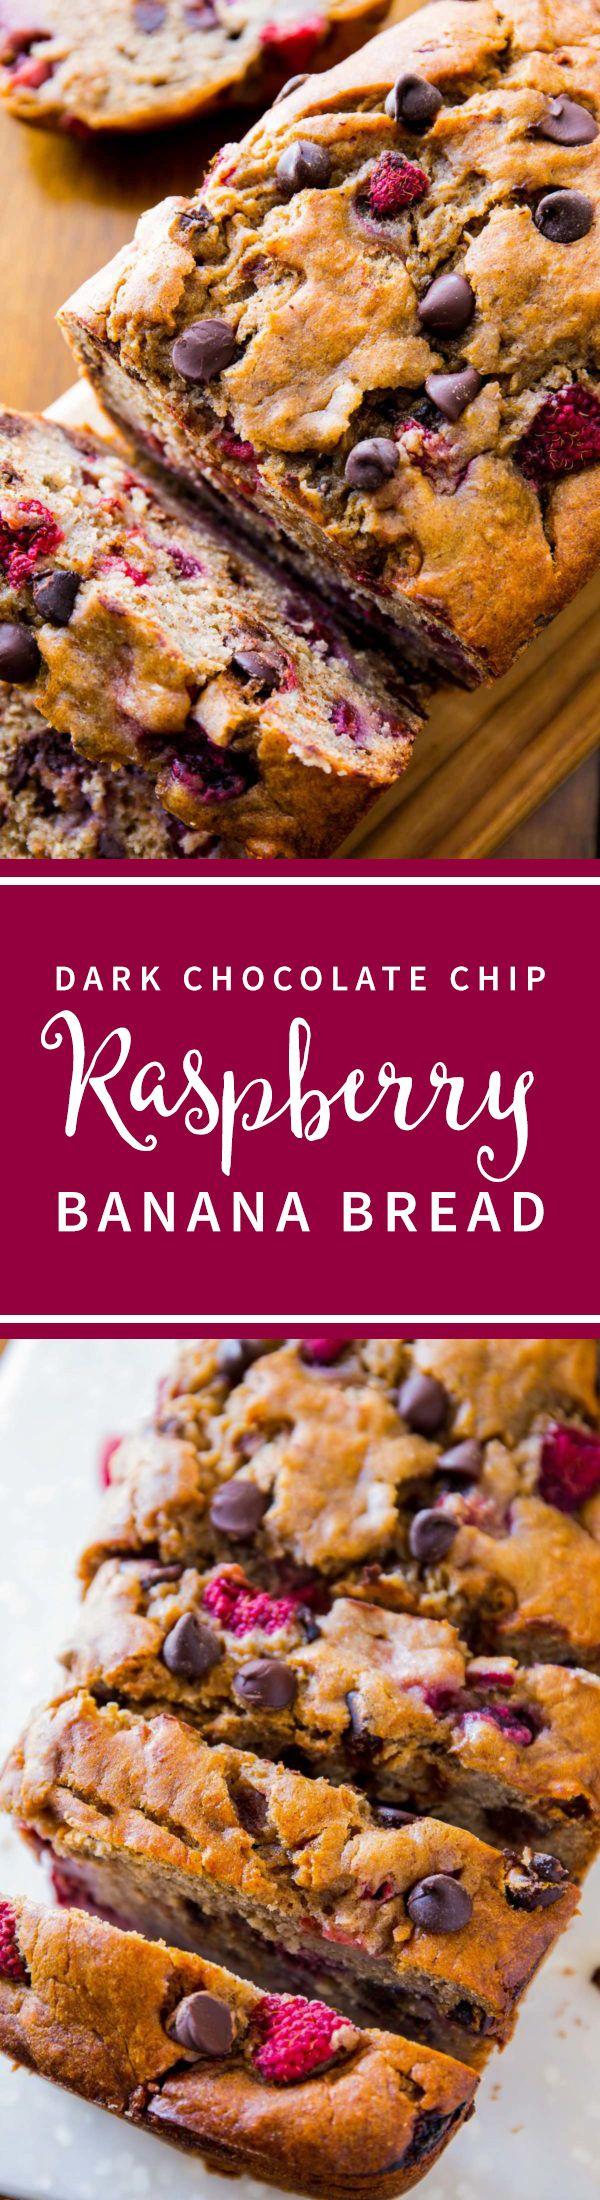 Moist banana bread with dark chocolate and raspberries! Easy recipe for banana bread on sallysbakingaddiction.com